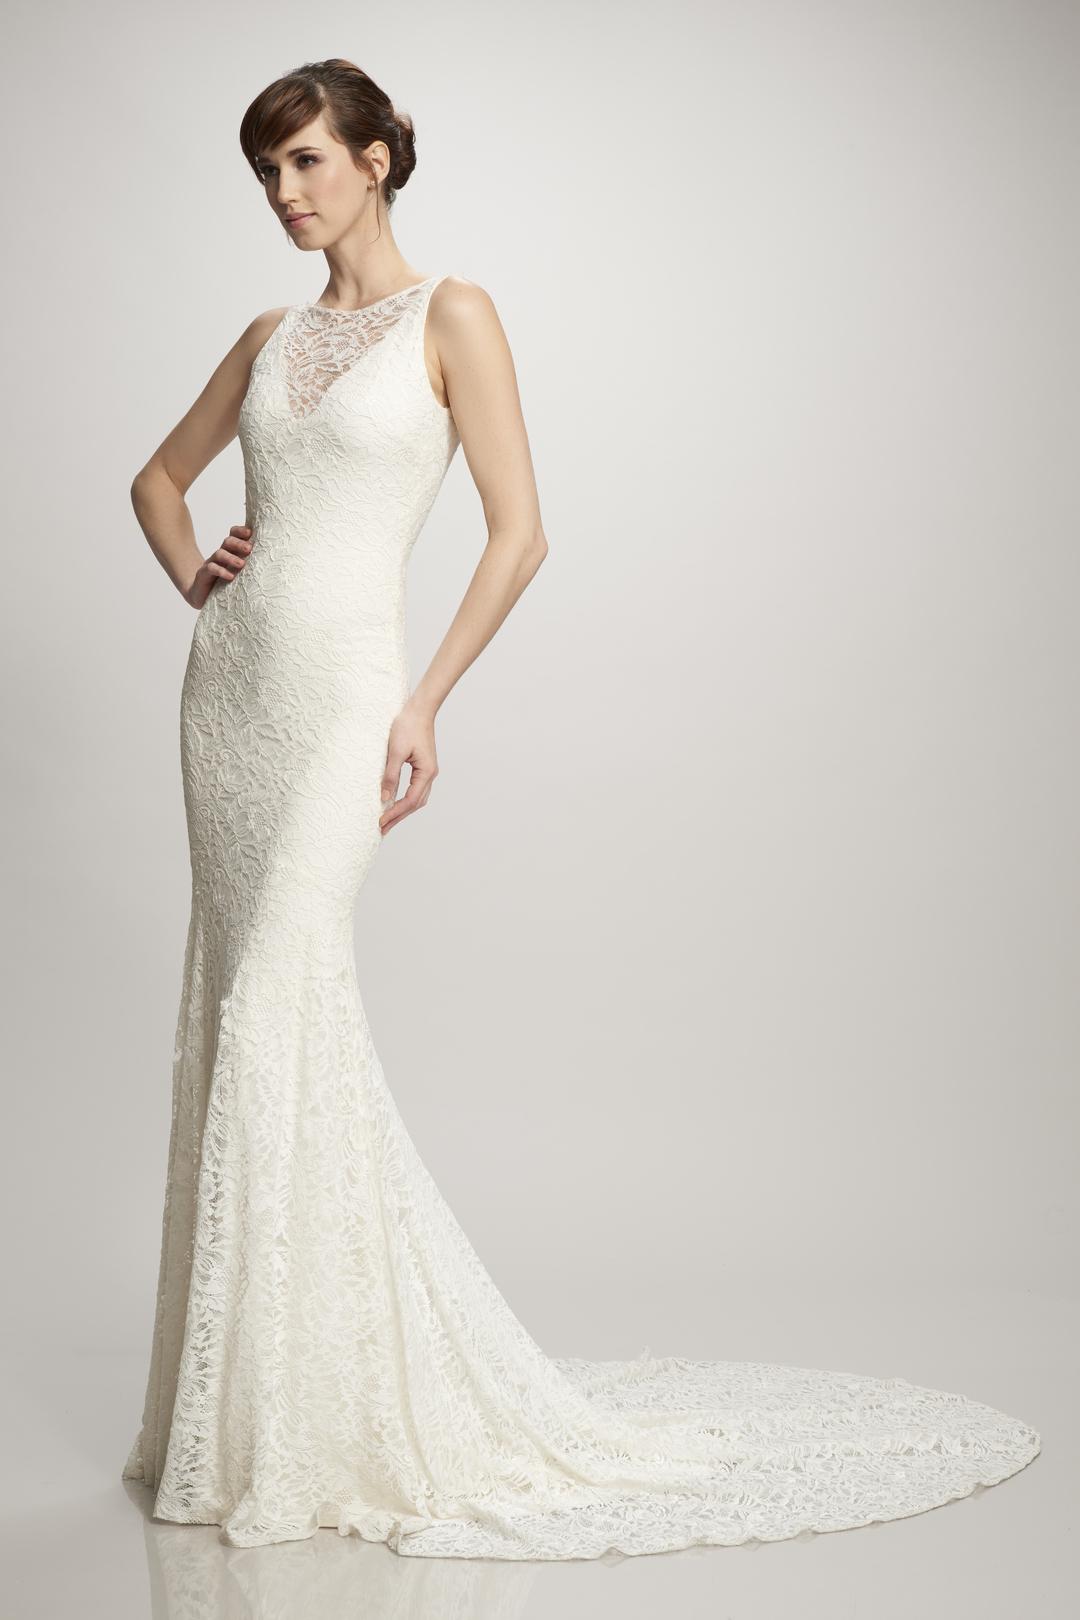 Dress main 2x 1547045413